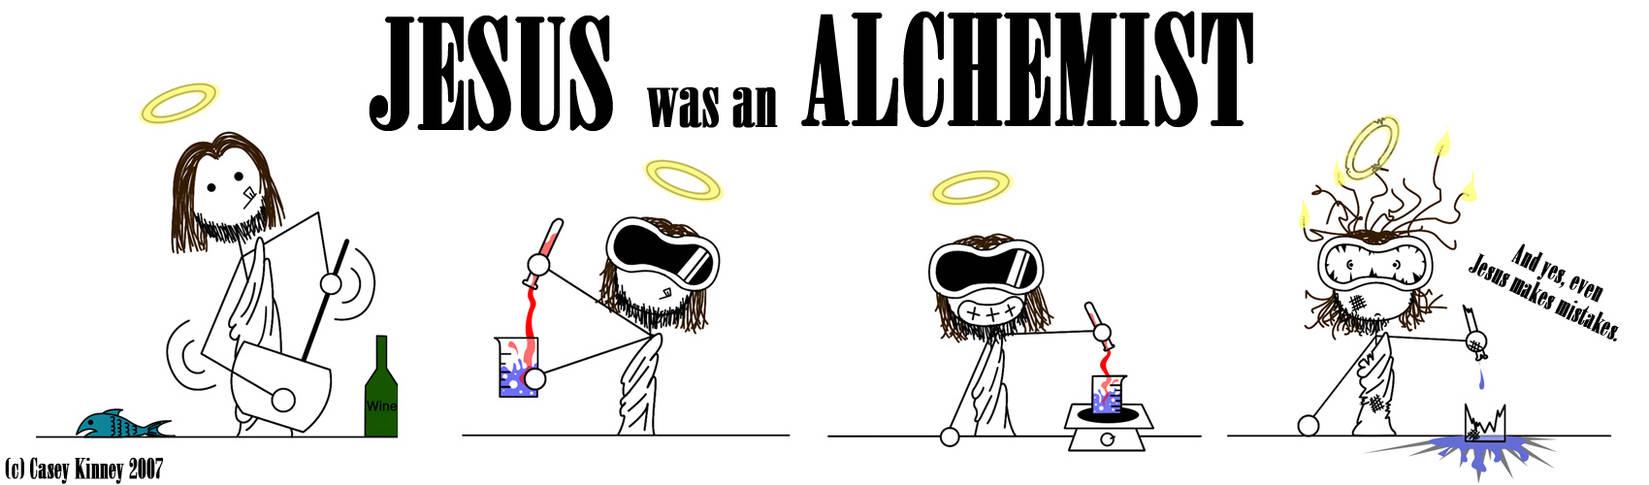 Jesus Was an Alchemist.